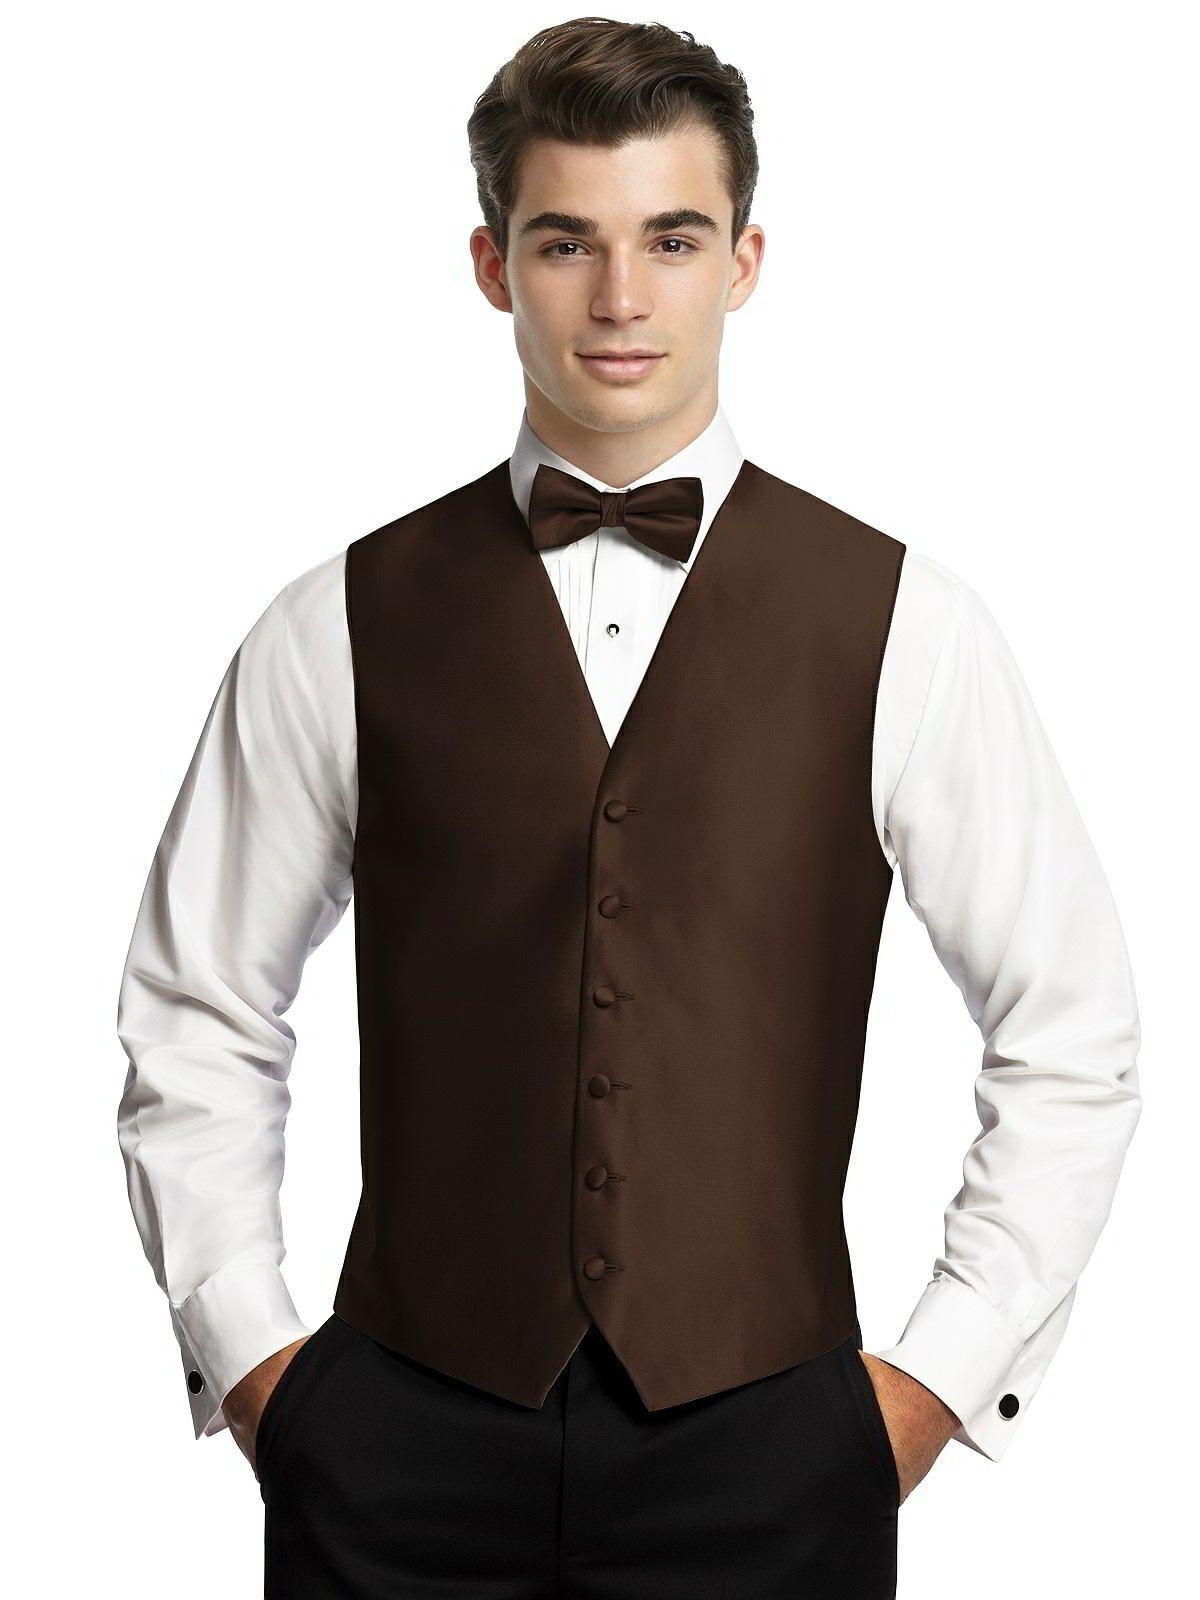 Men's Tuxedo Vest By After Six. Match Dessy Wedding Colors